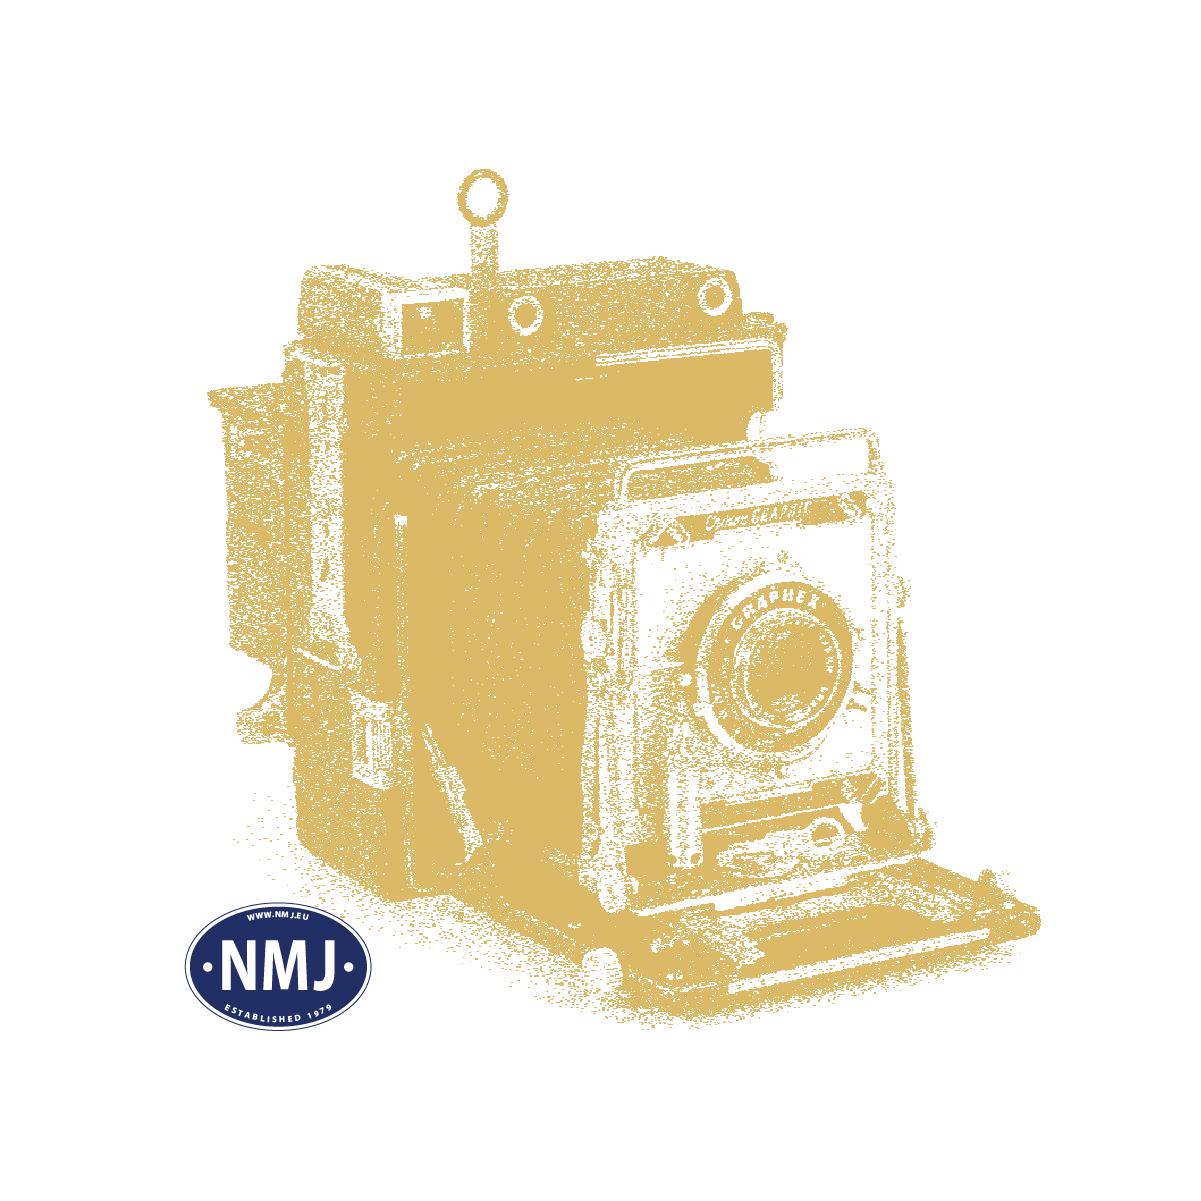 NMJT245002 - NMJ Topline NSB Di3a 622 Gammeldesign, 0-Skala, DCC m/Lyd